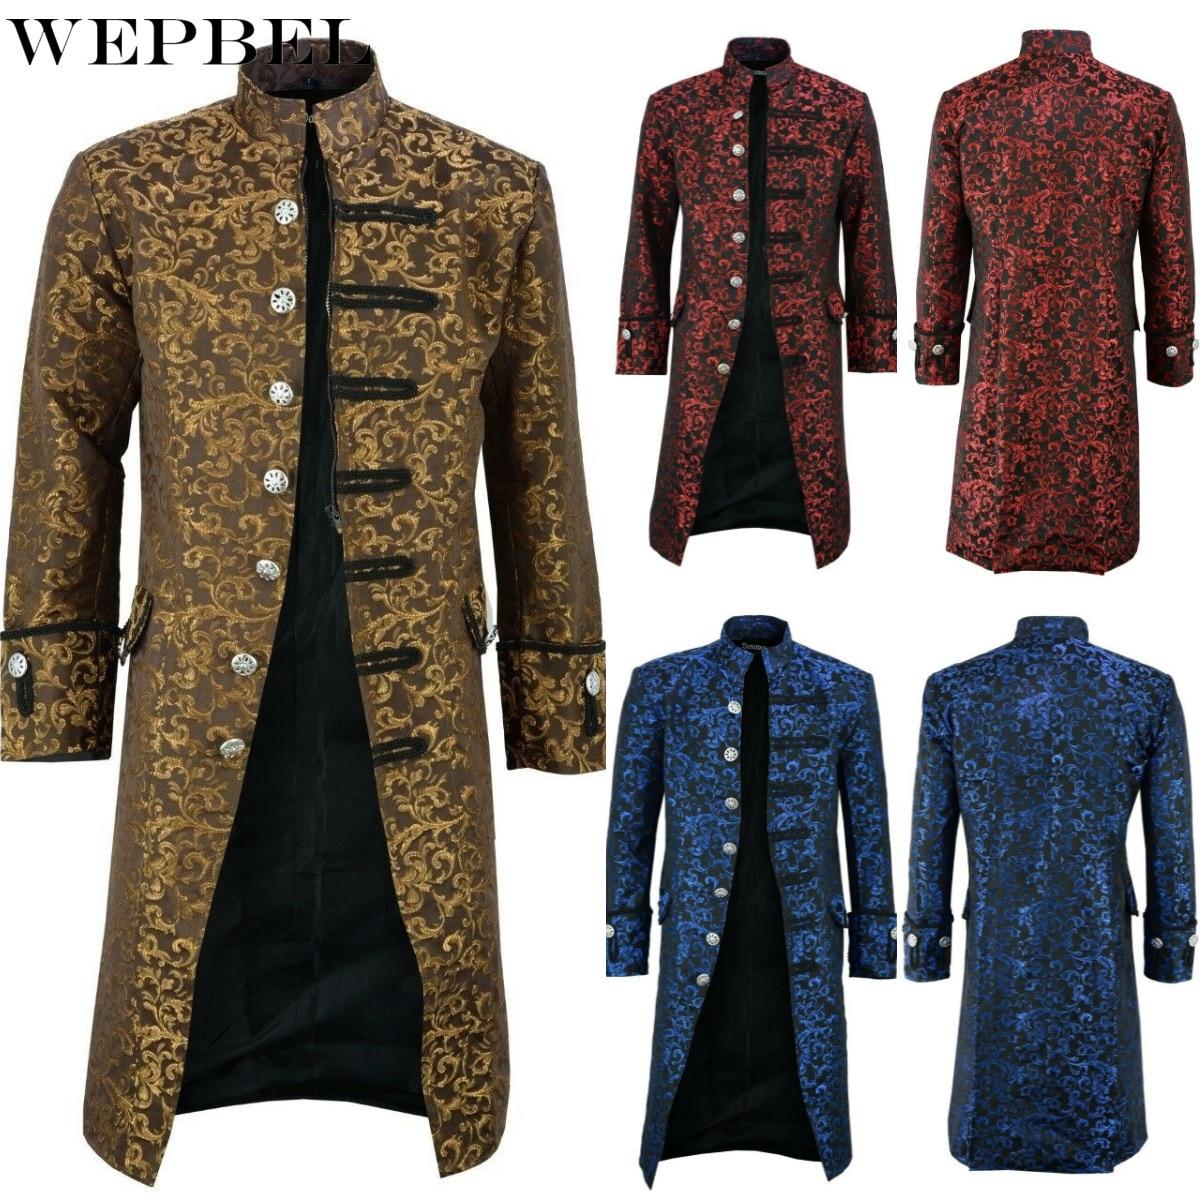 WEPBEL عالية الجودة الرجال القرون الوسطى عصر النهضة خمر طوق زرر سترات Steampunk الفيكتوري زي تأثيري معطف (S-5XL)